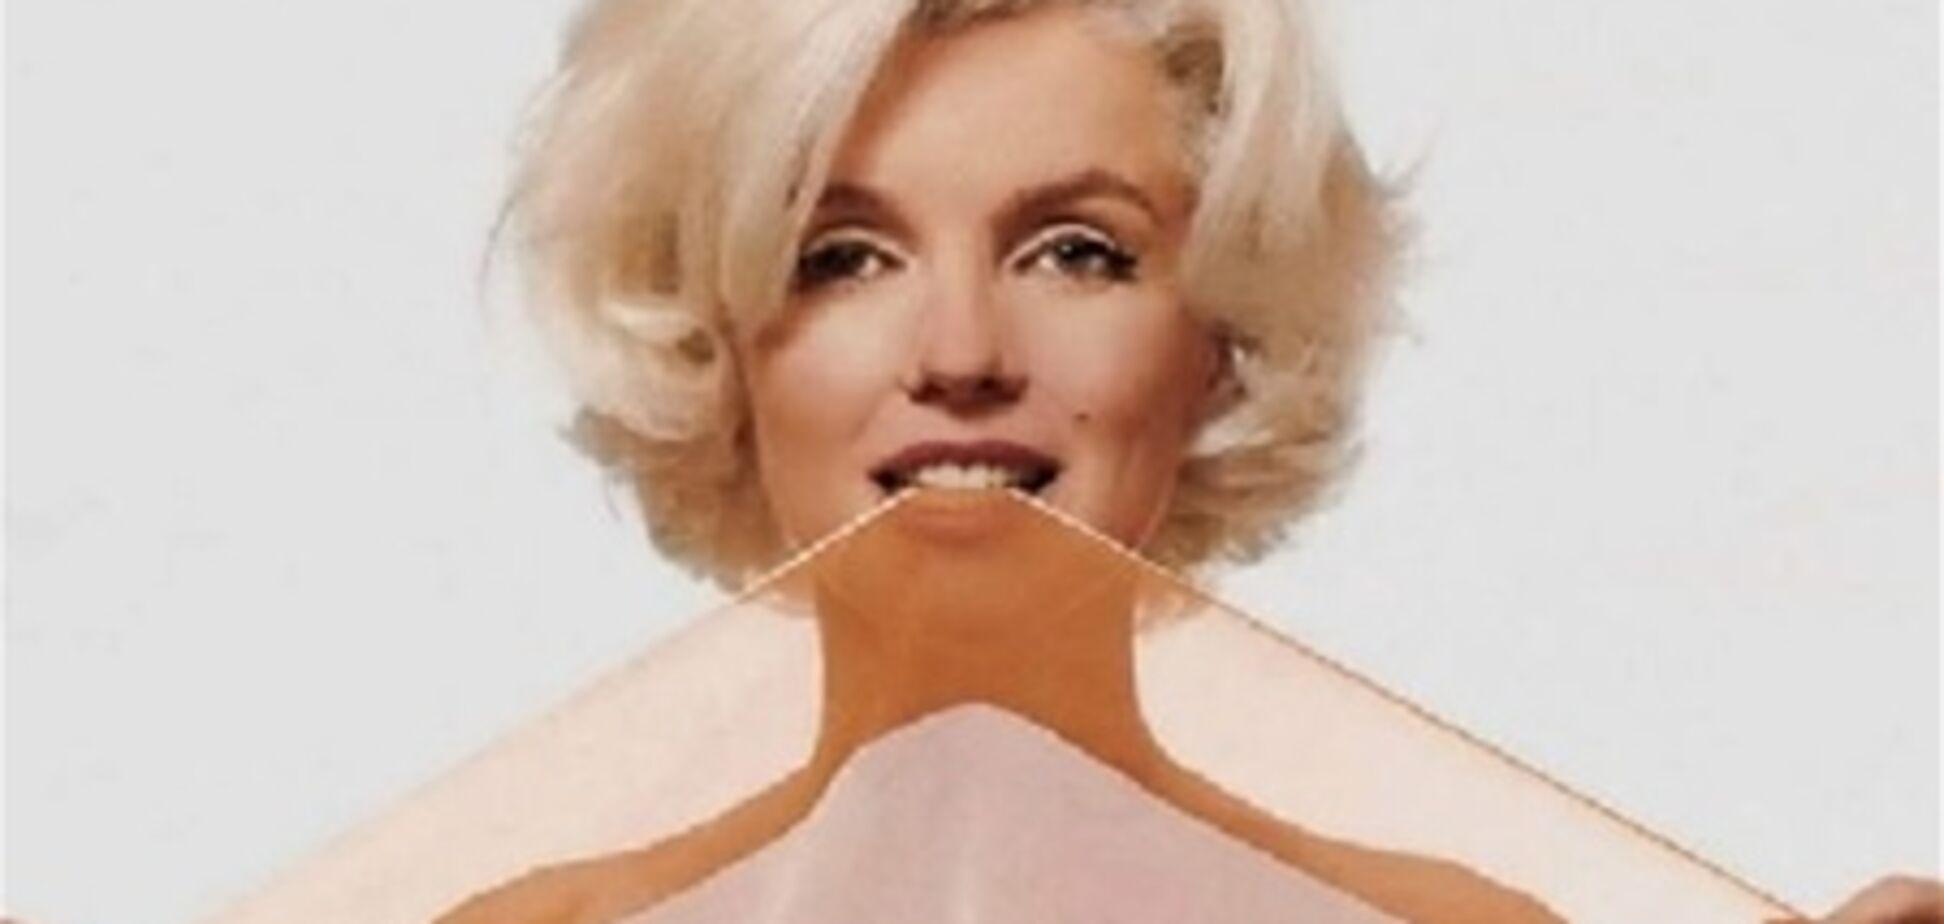 Гола Монро знову прикрасила обкладинку Playboy. Фото